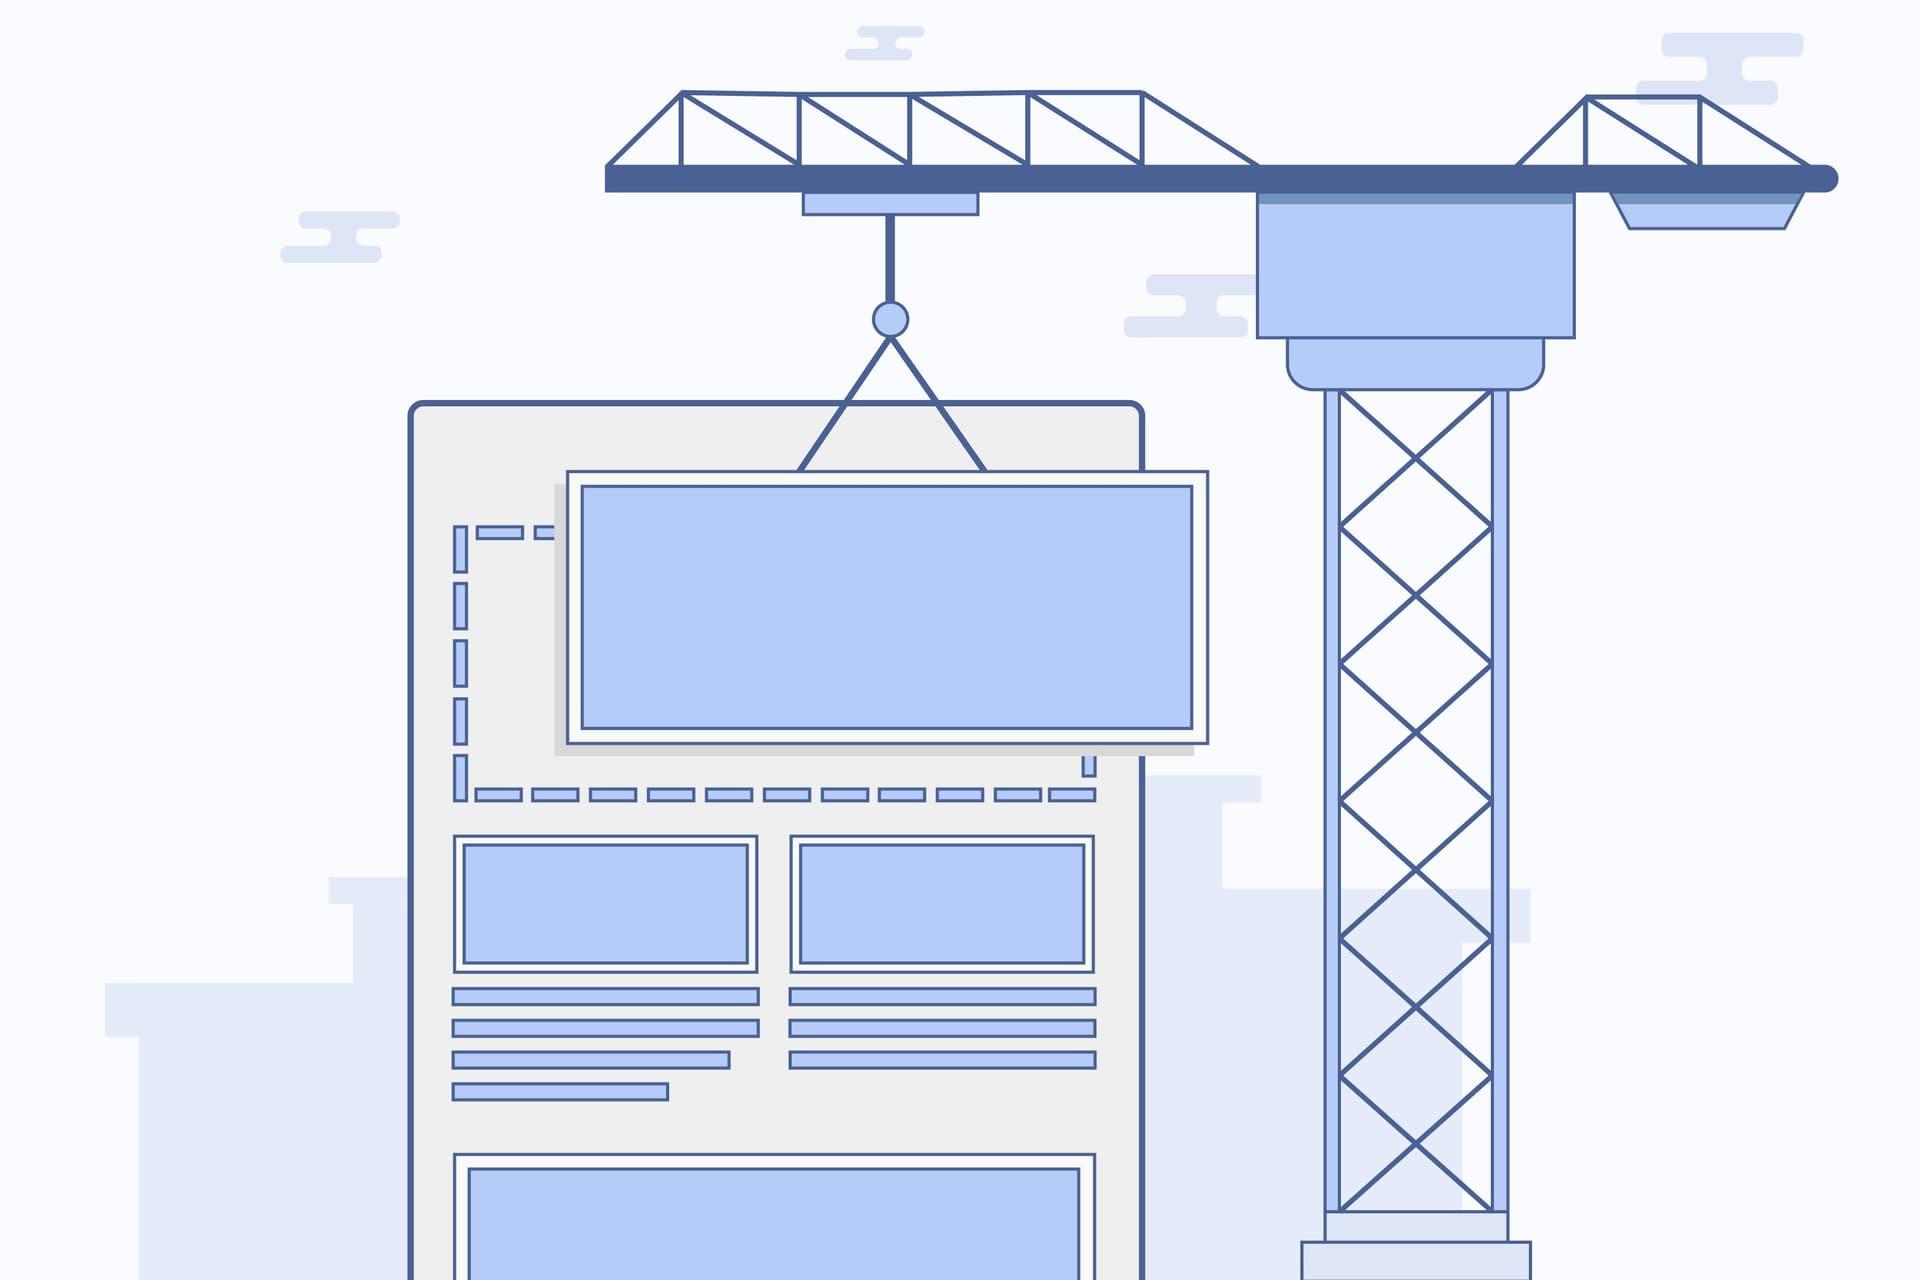 Cartoon crane illustrating building a website